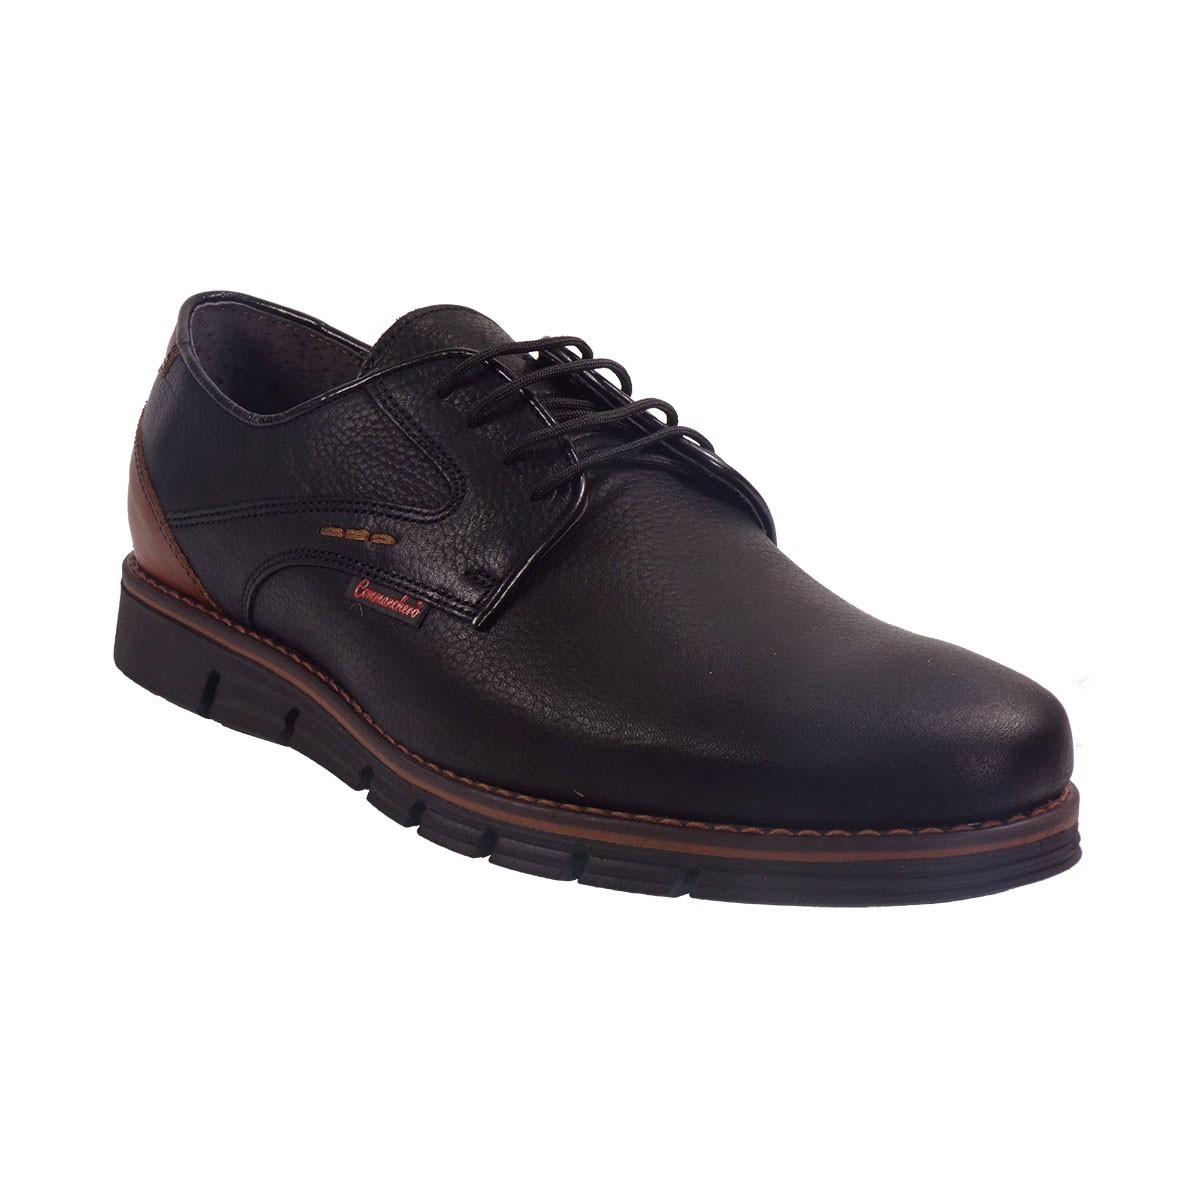 Commanchero Ανδρικά Παπούτσια 72068-721 Μαύρο Δέρμα